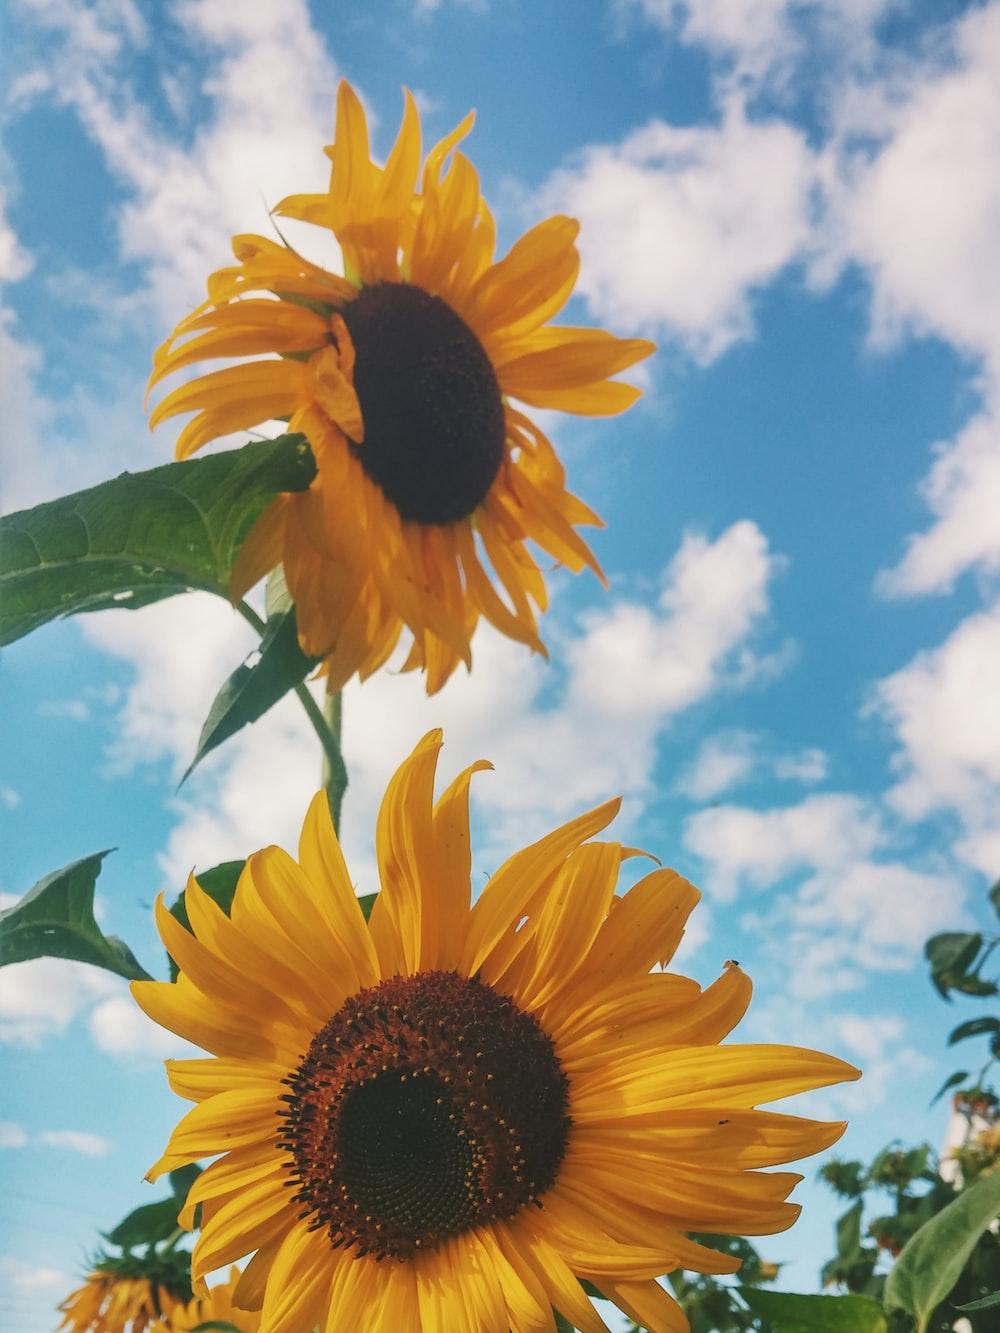 closeup photo of sunflower